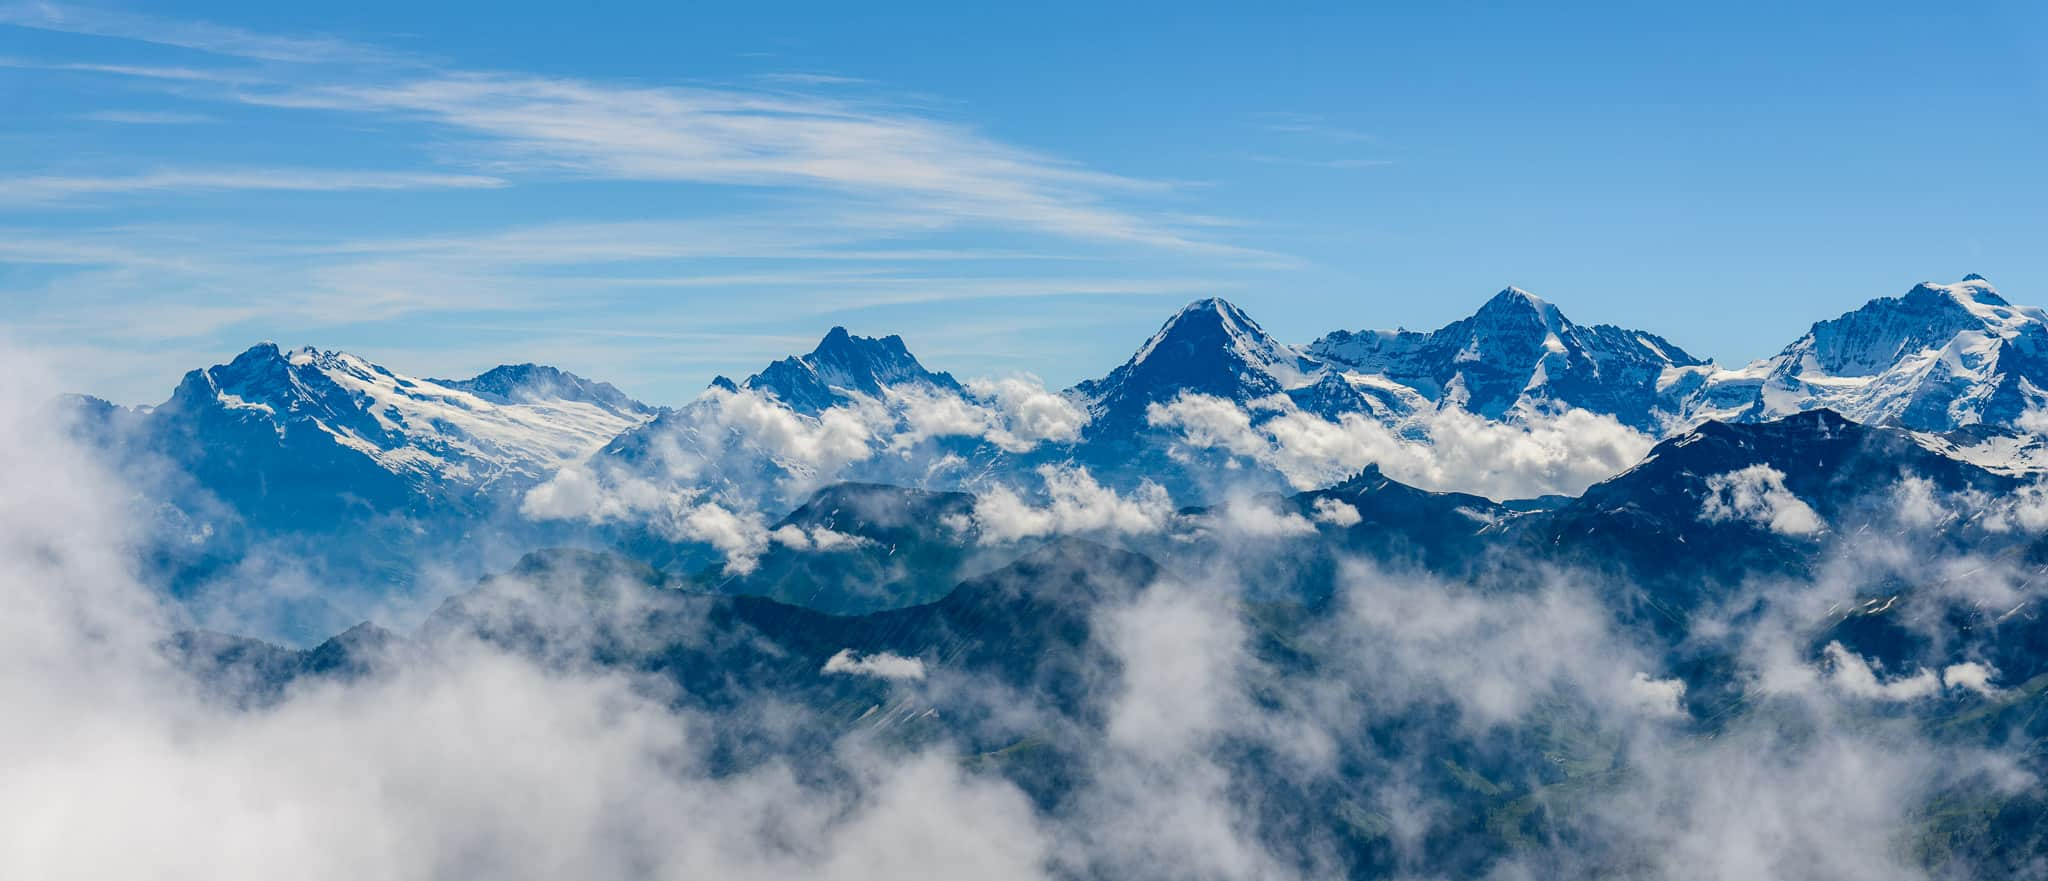 100 gratis Zwitserland dating sites